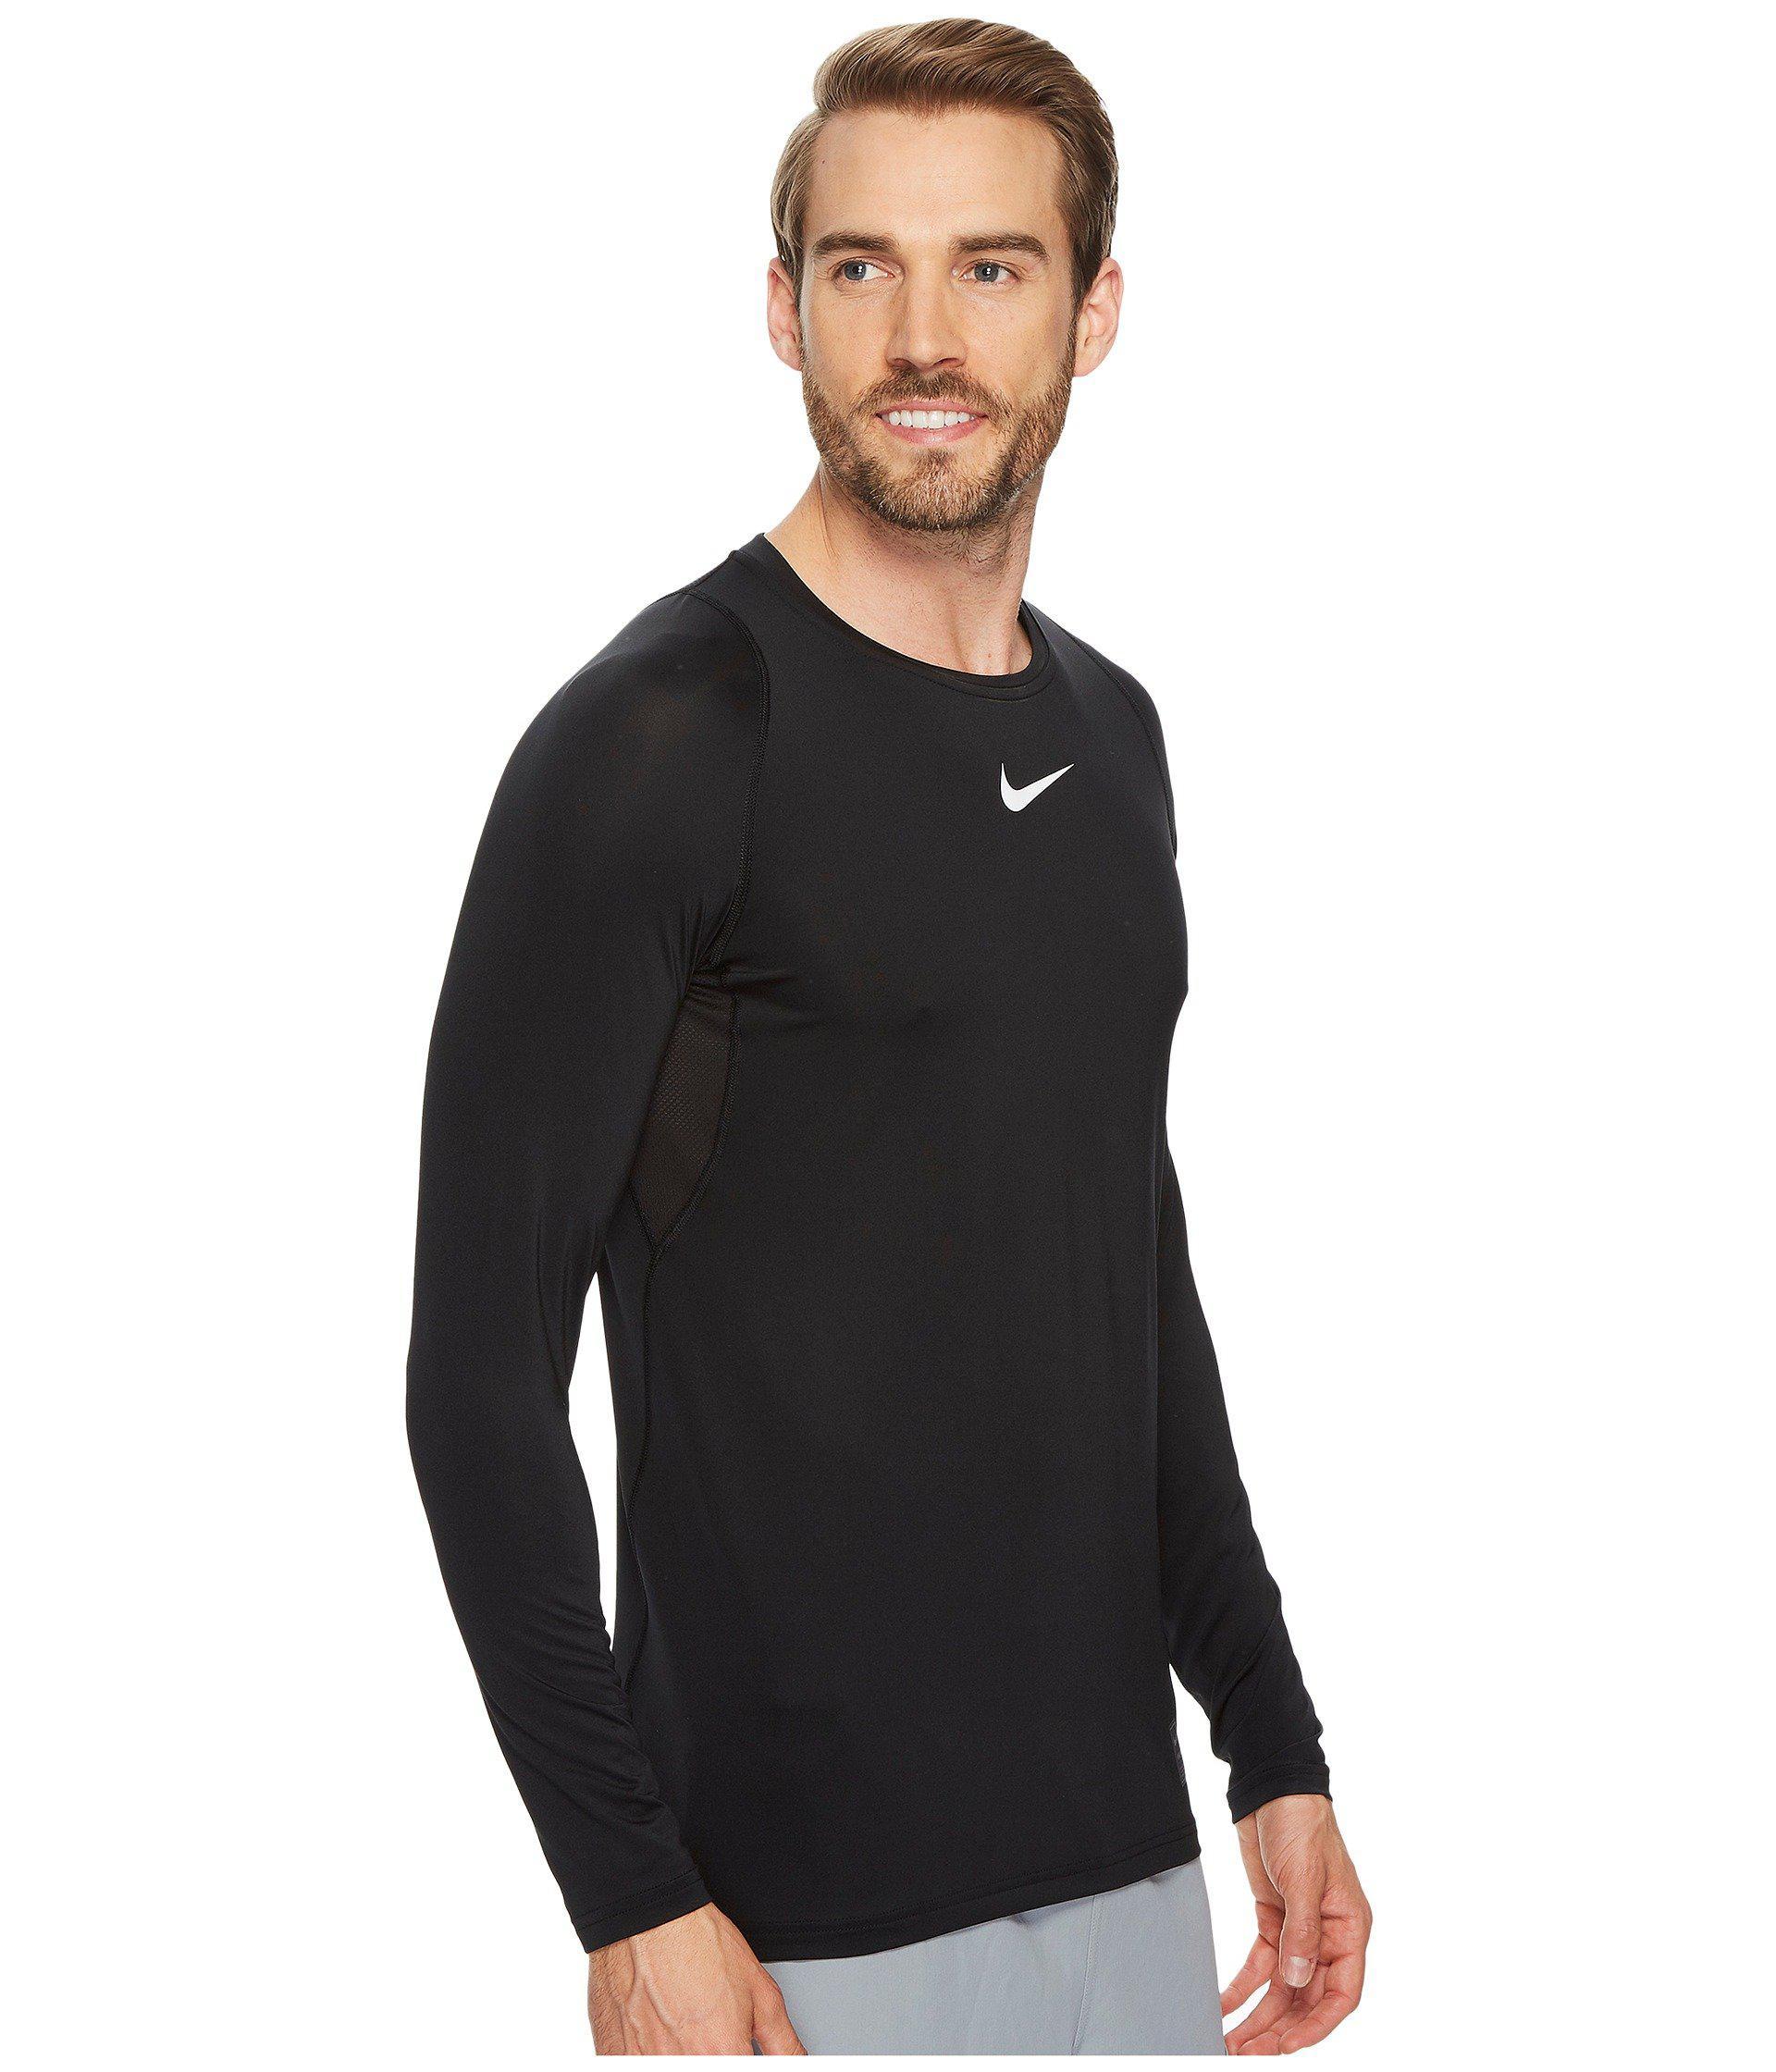 925d358e Nike - Black Pro Fitted Long Sleeve Training Top (obsidian/white/white).  View fullscreen